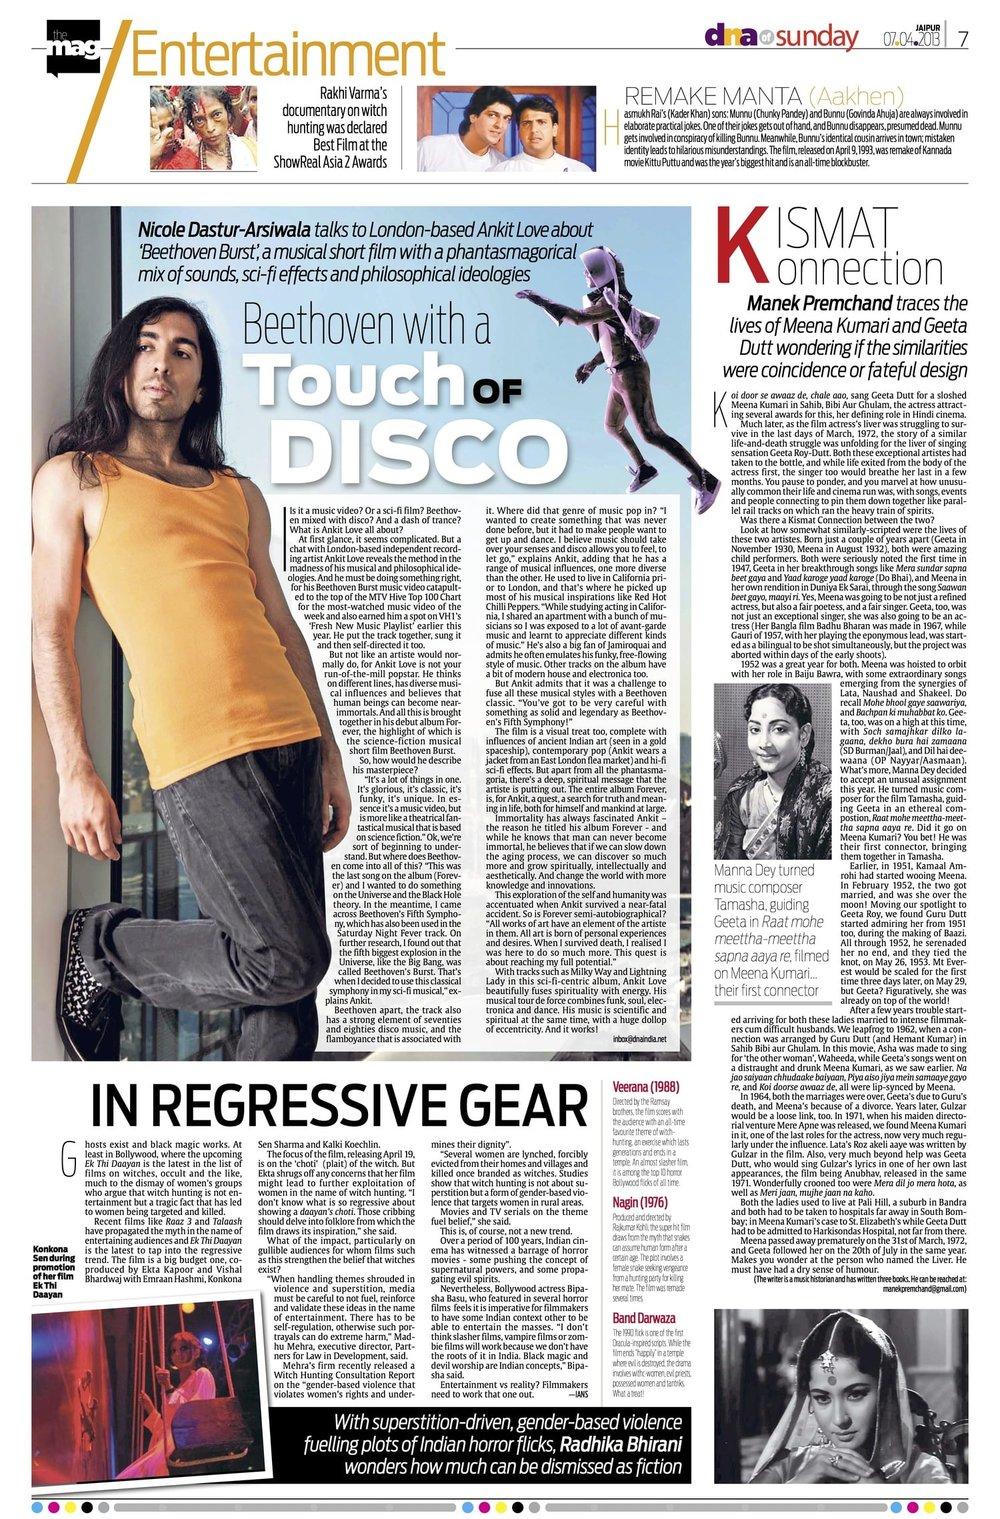 Ankit Love DNA News Magazine Entertainement.jpeg